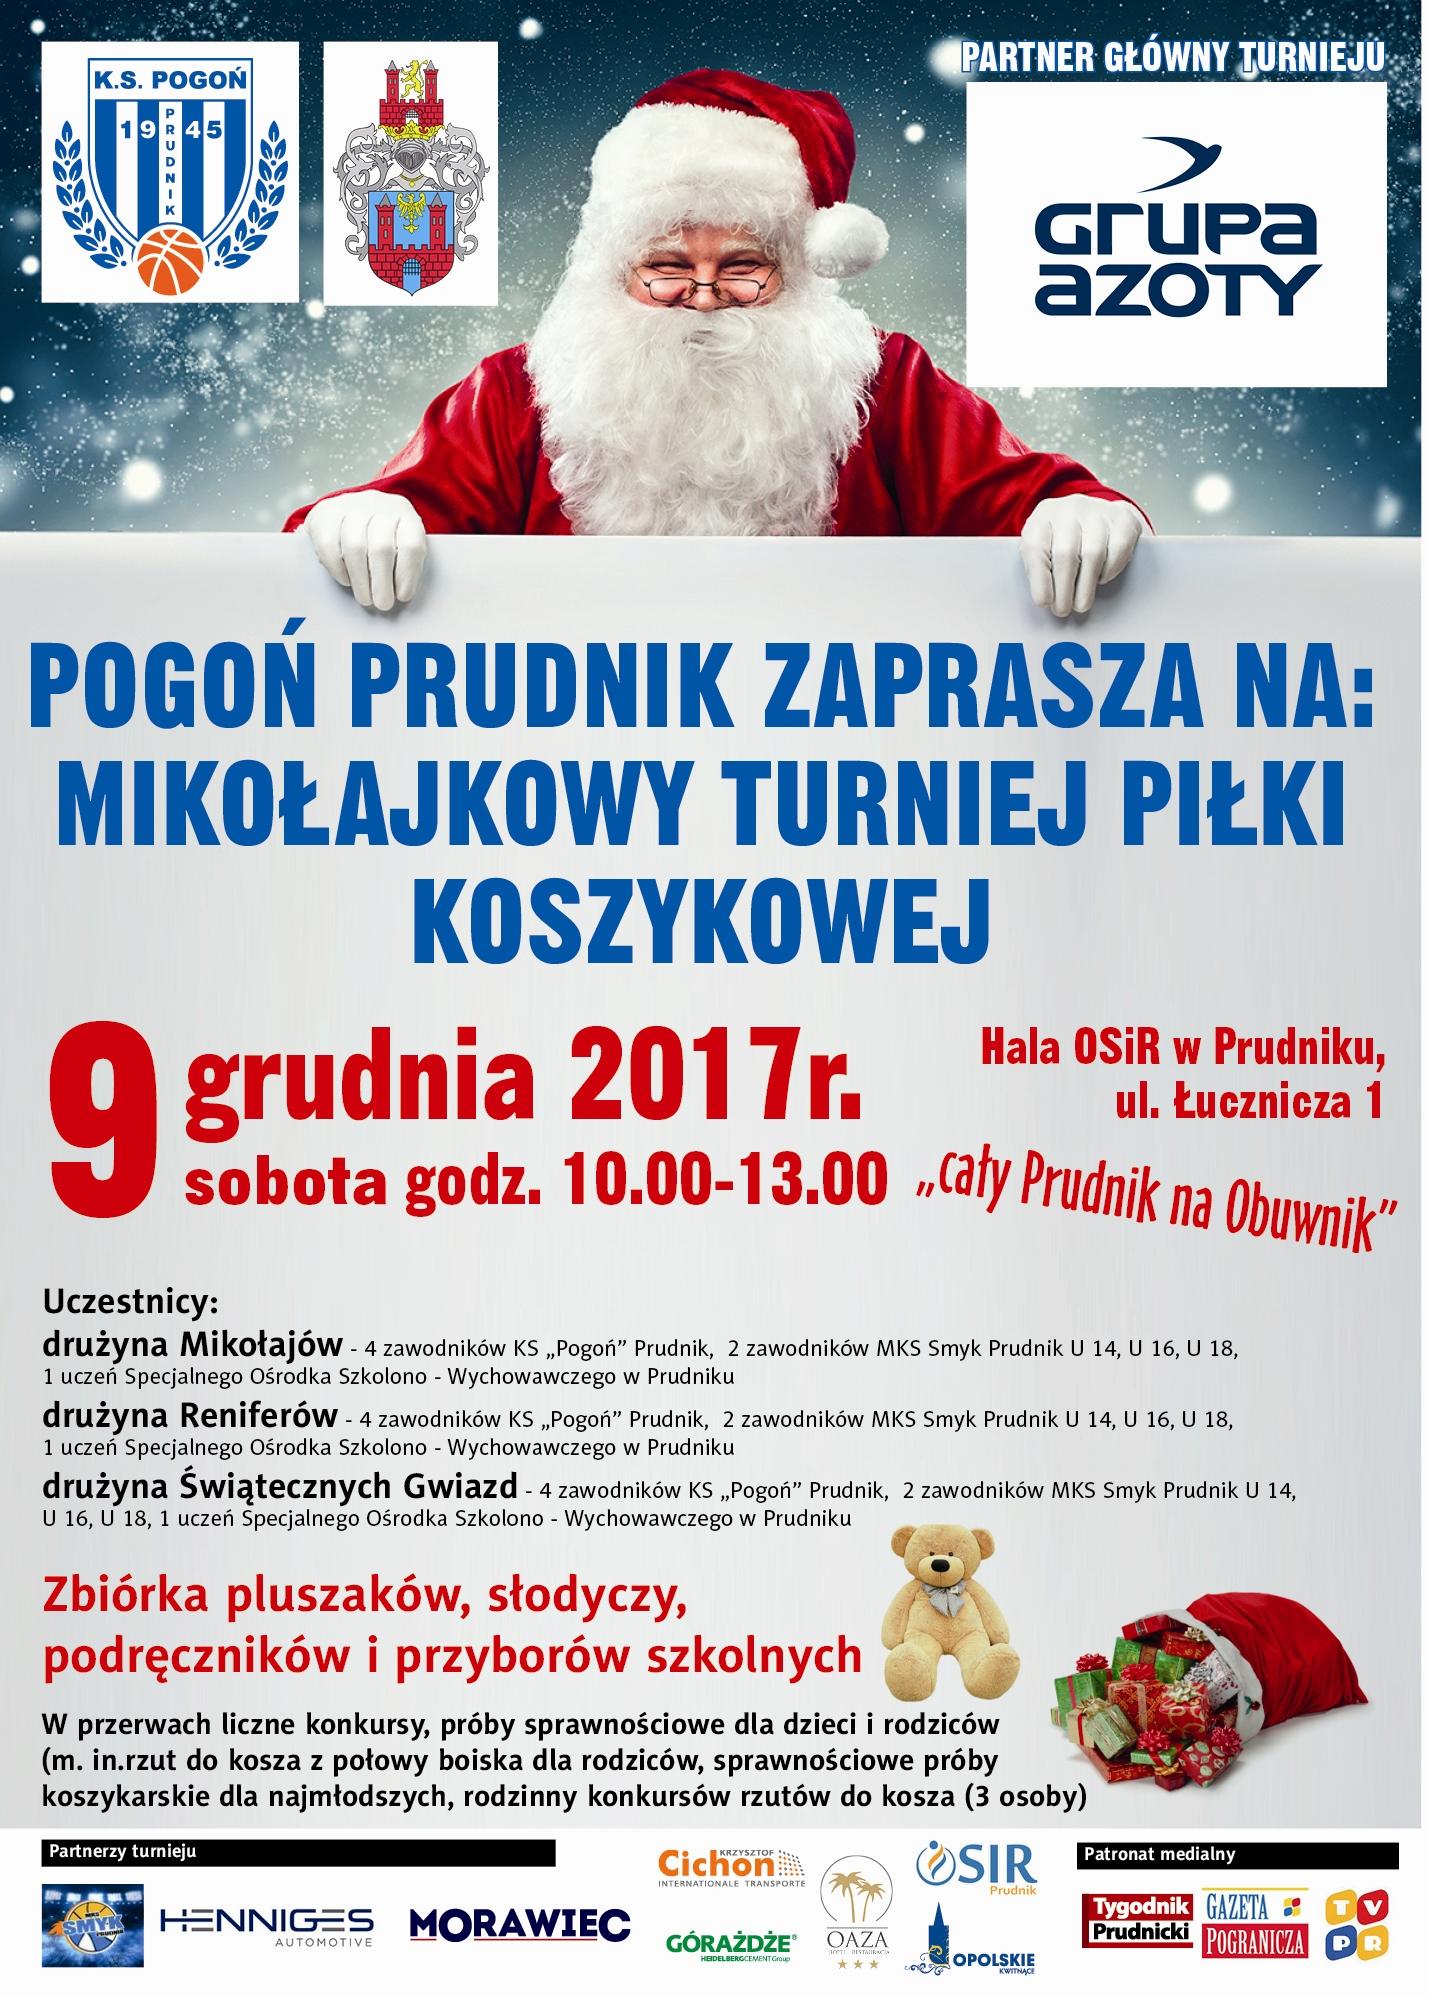 http://kspogonprudnik.pl//upload/obrazy/turniej_mikolajkowy.JPG